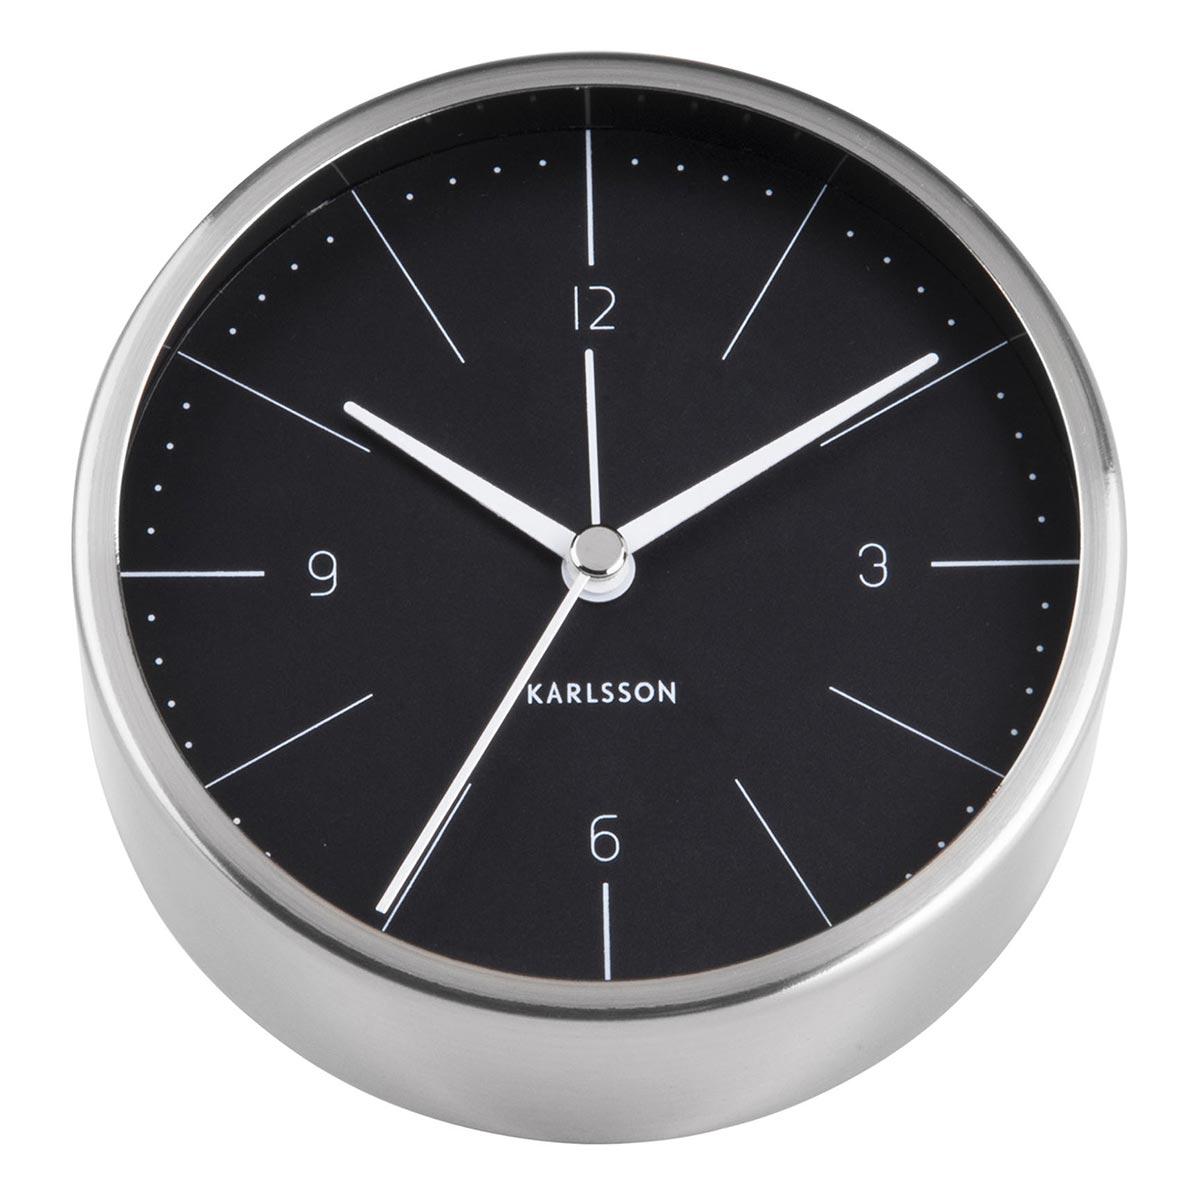 KARLSSON Normann alarm clock steel case black dial | the design gift shop